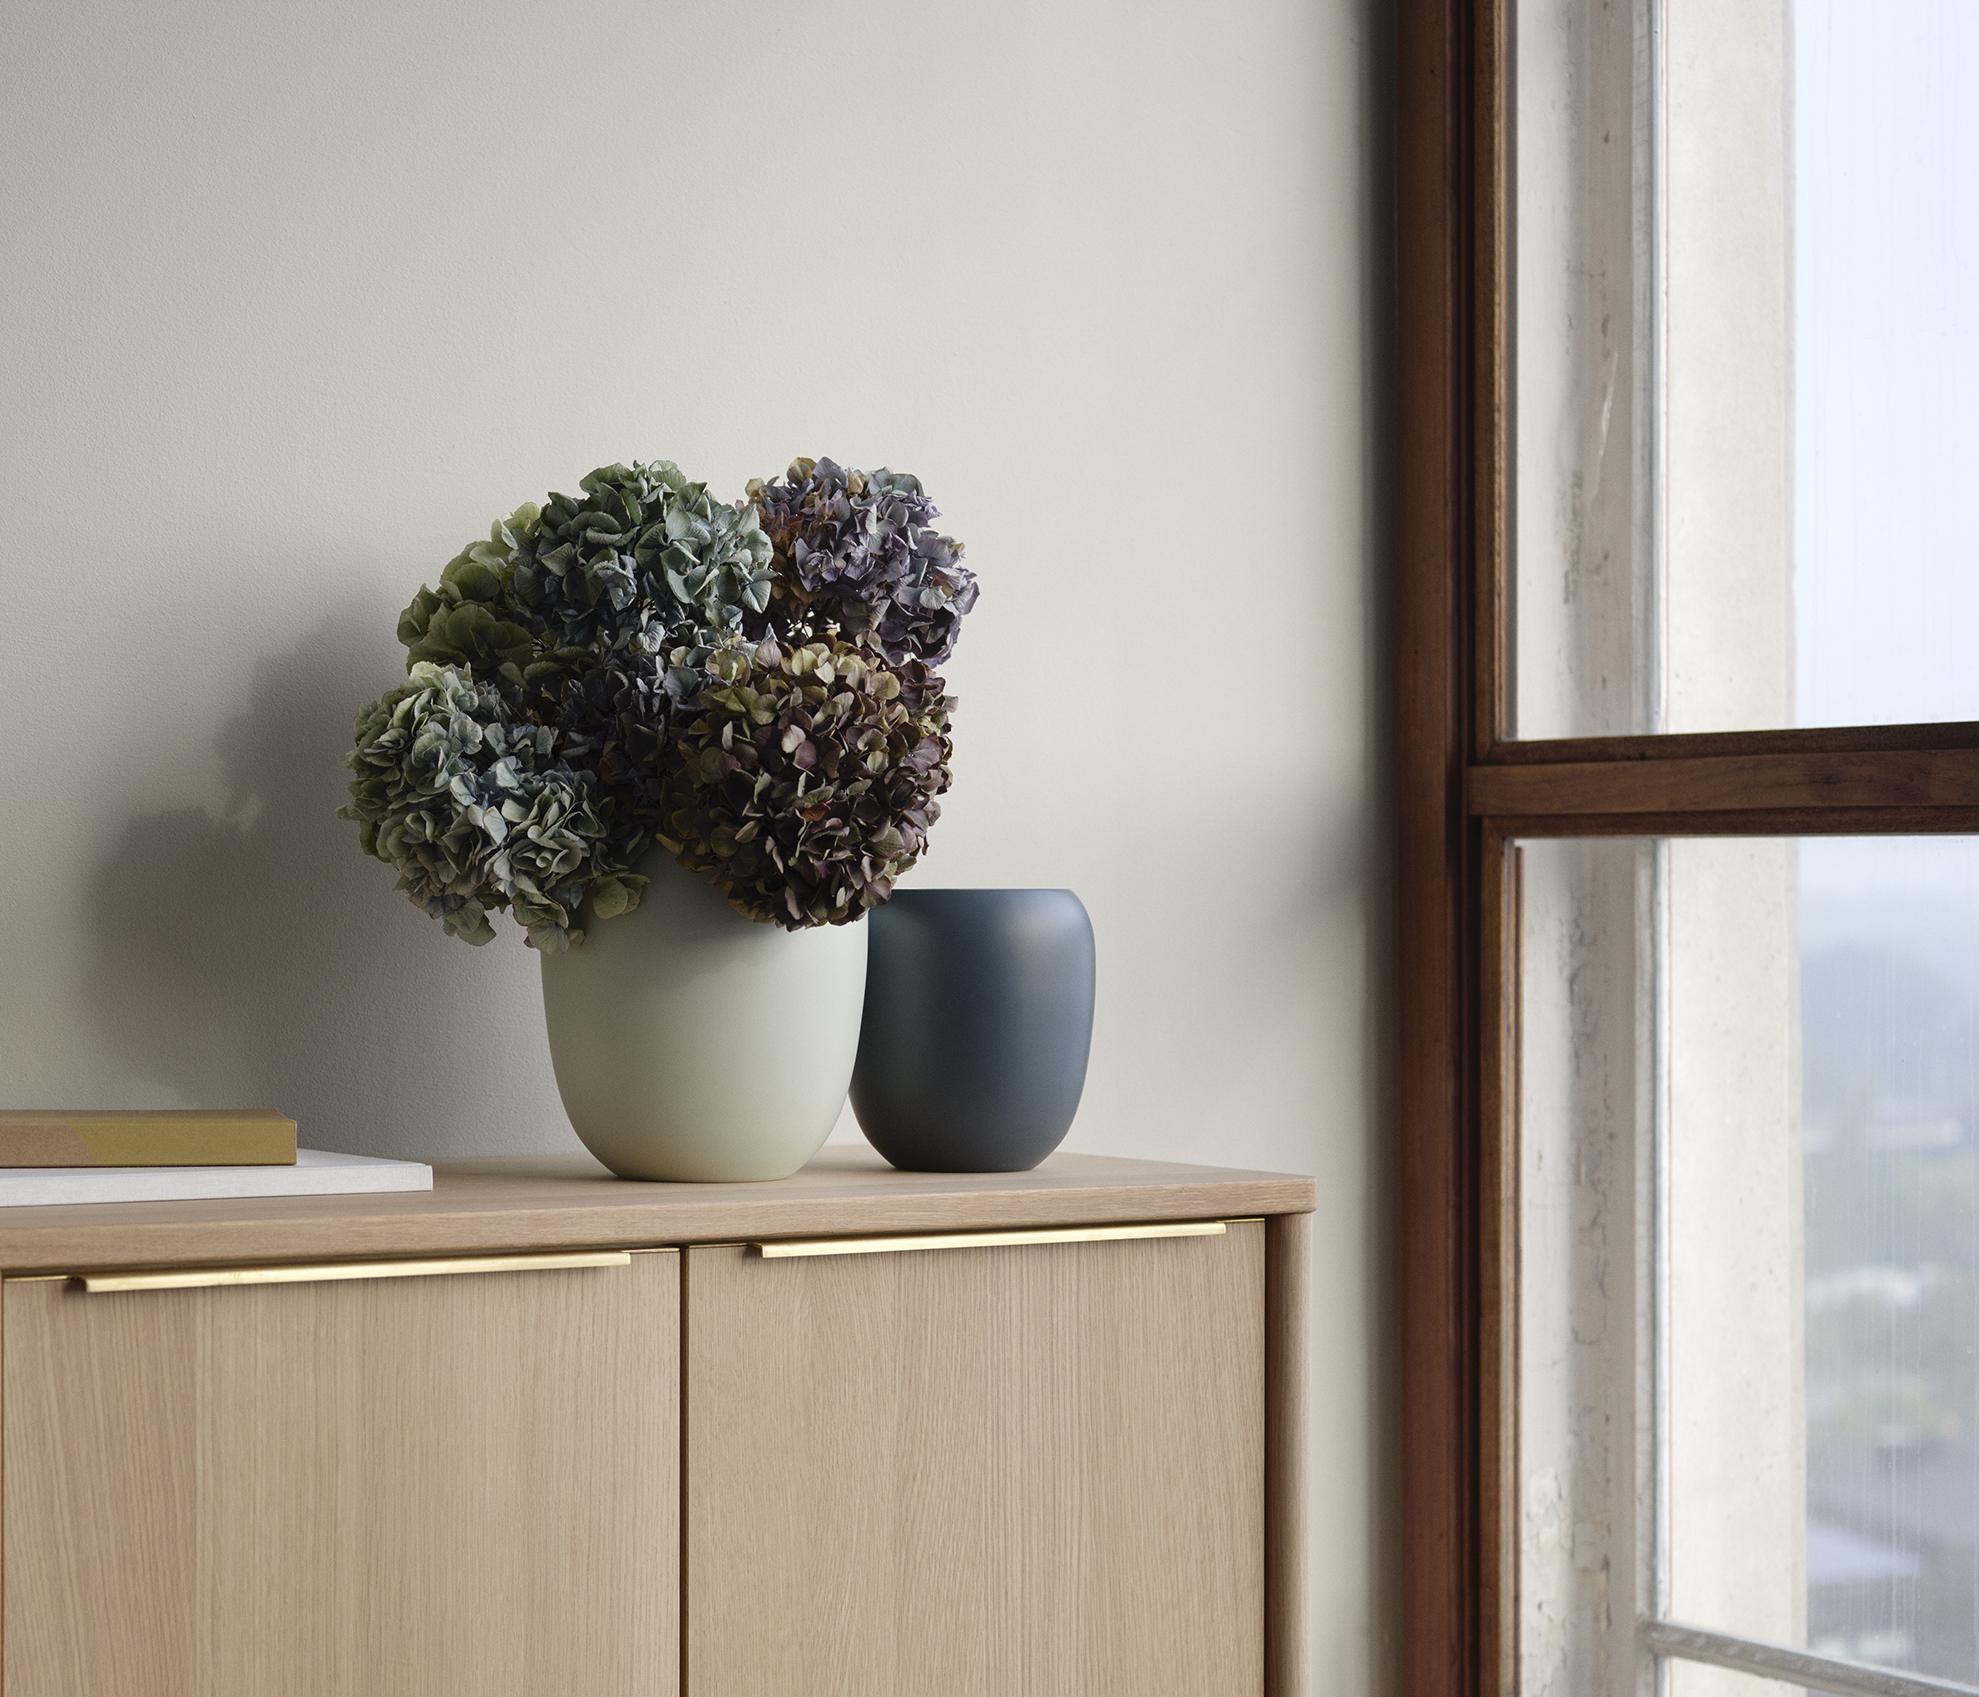 Blue and Mint Ora Vases designed by Debiasi Sandri for Stelton